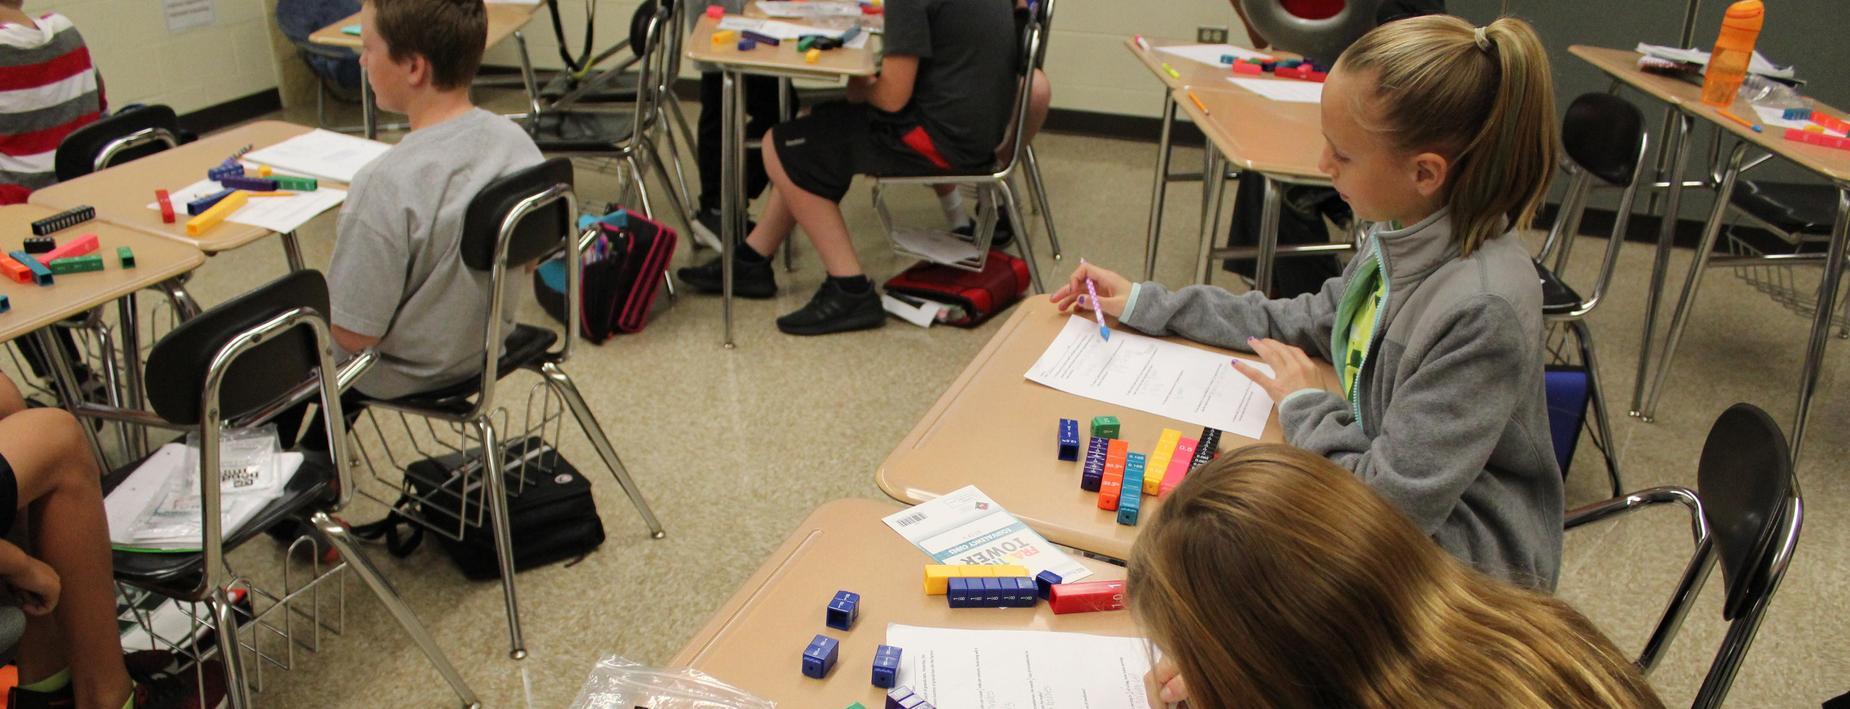 Using manipulatives in math class